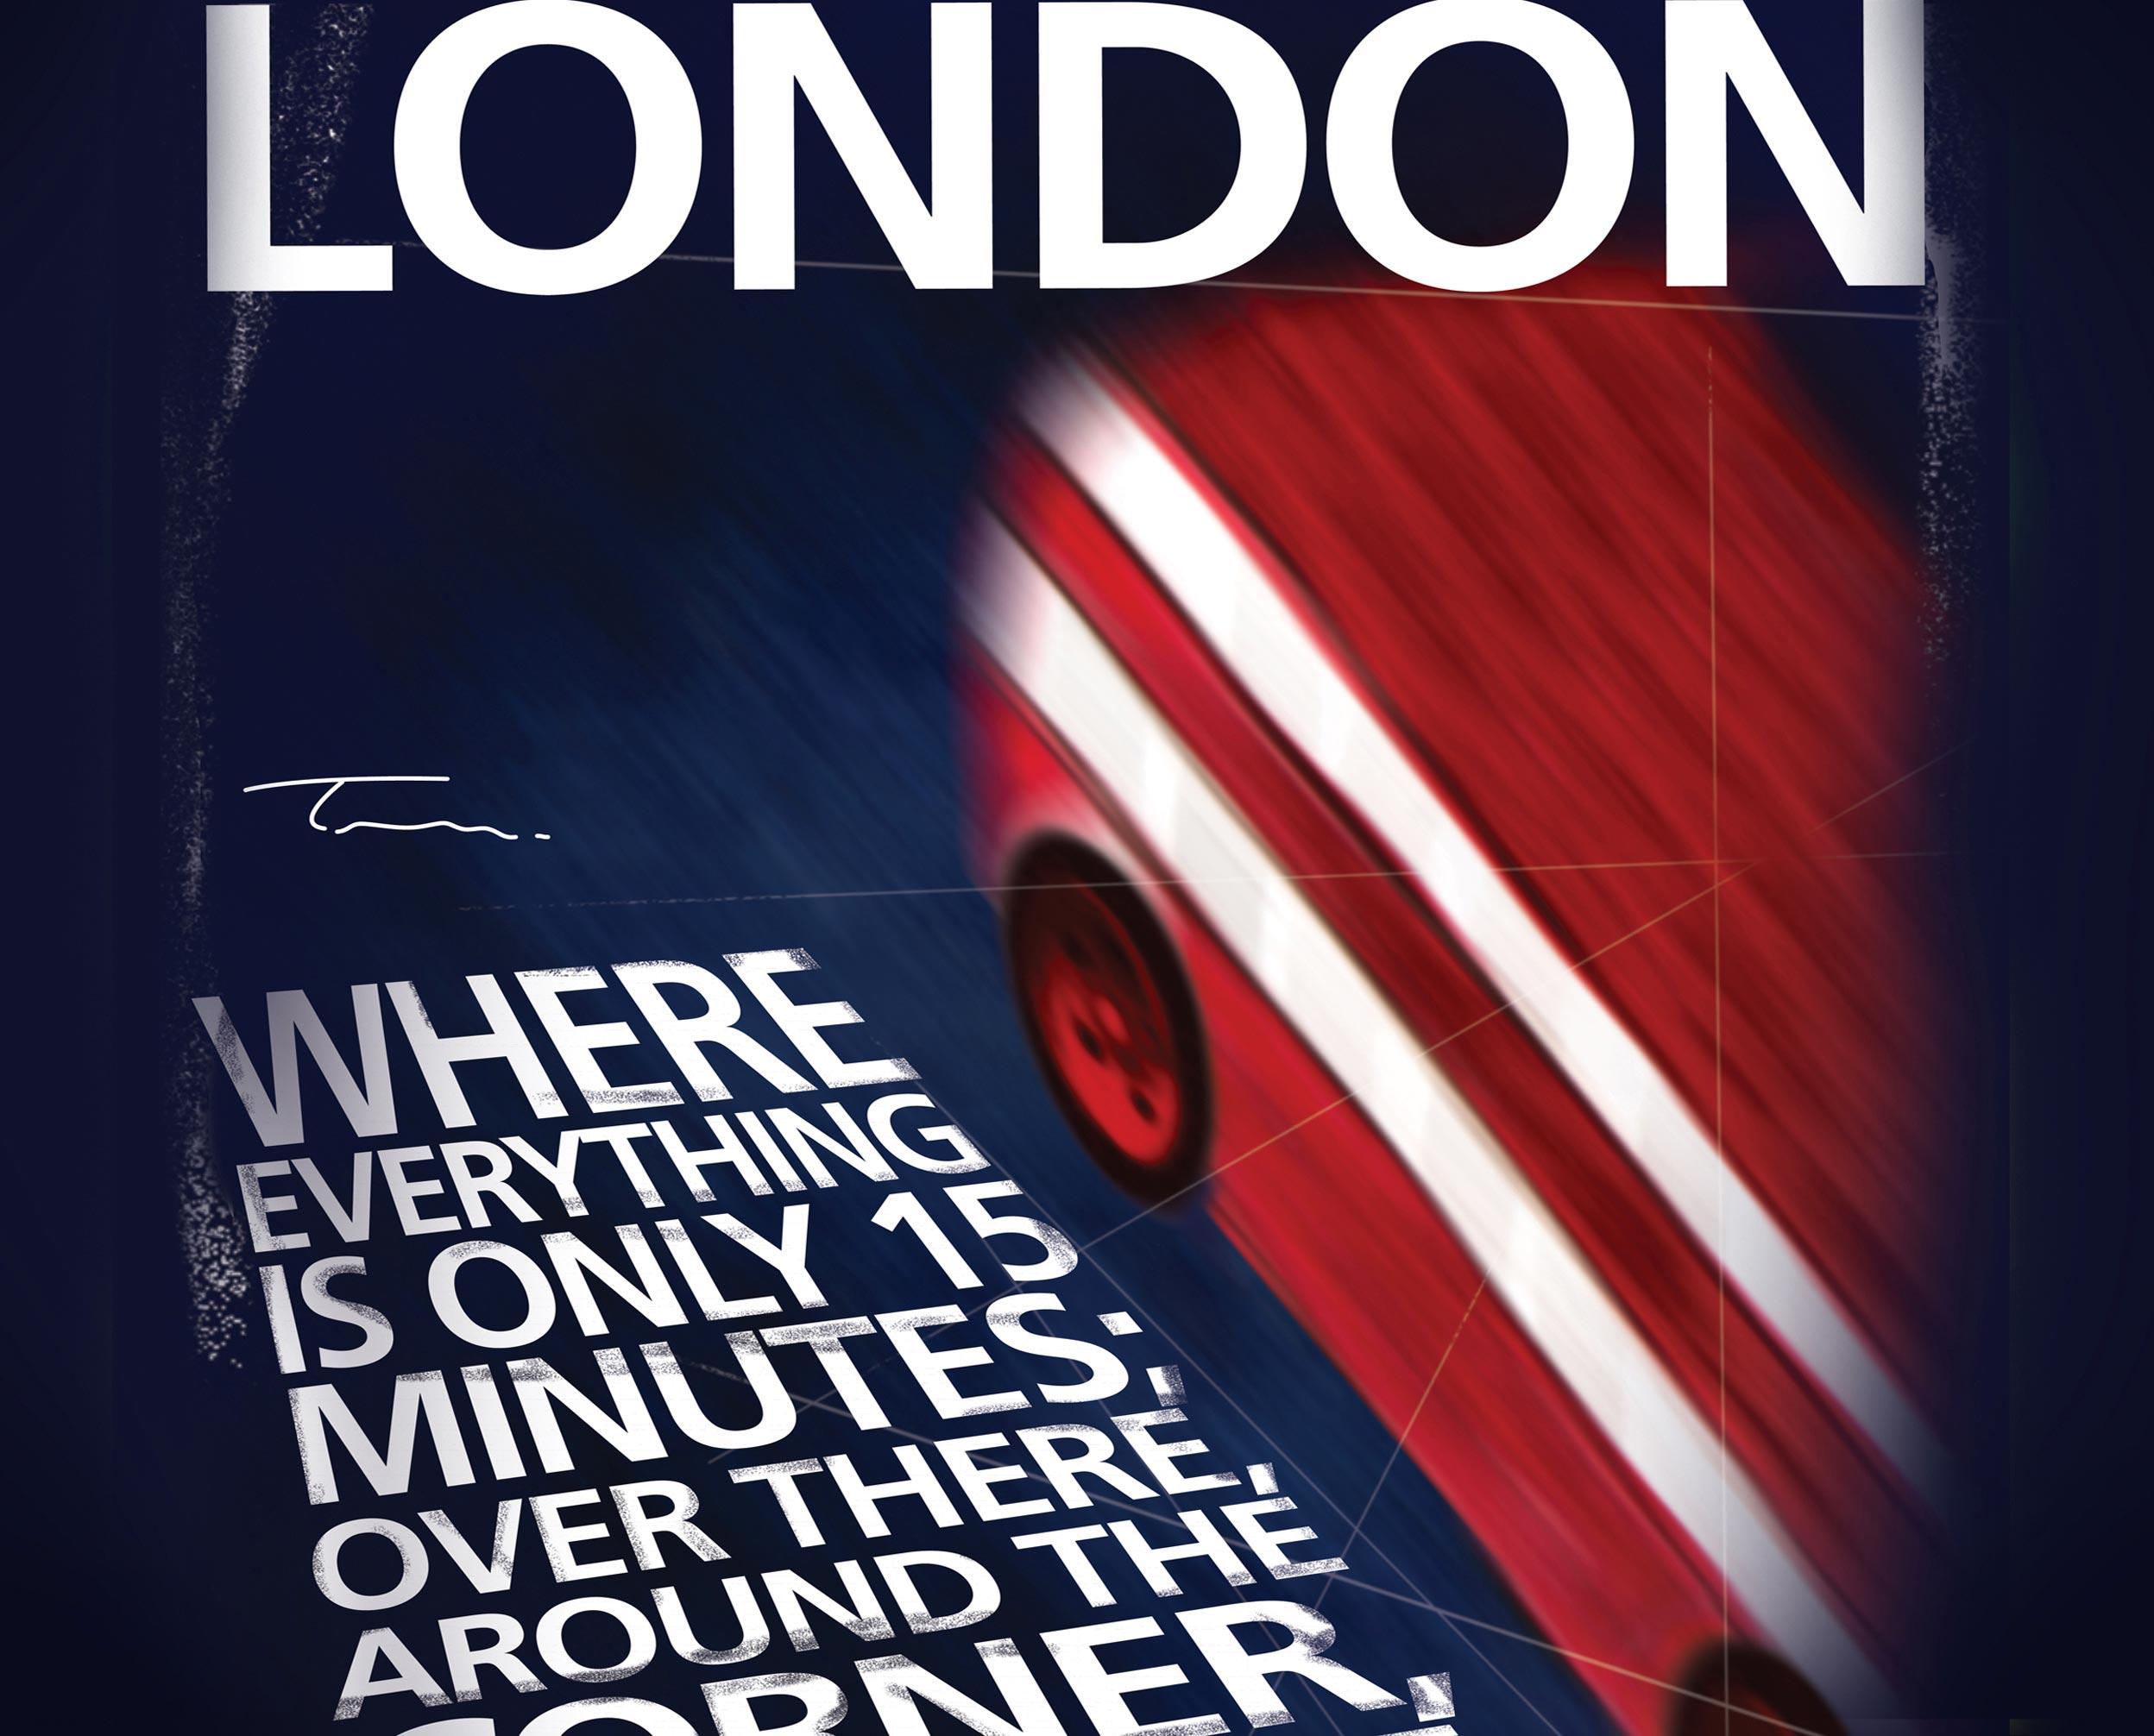 London travel print